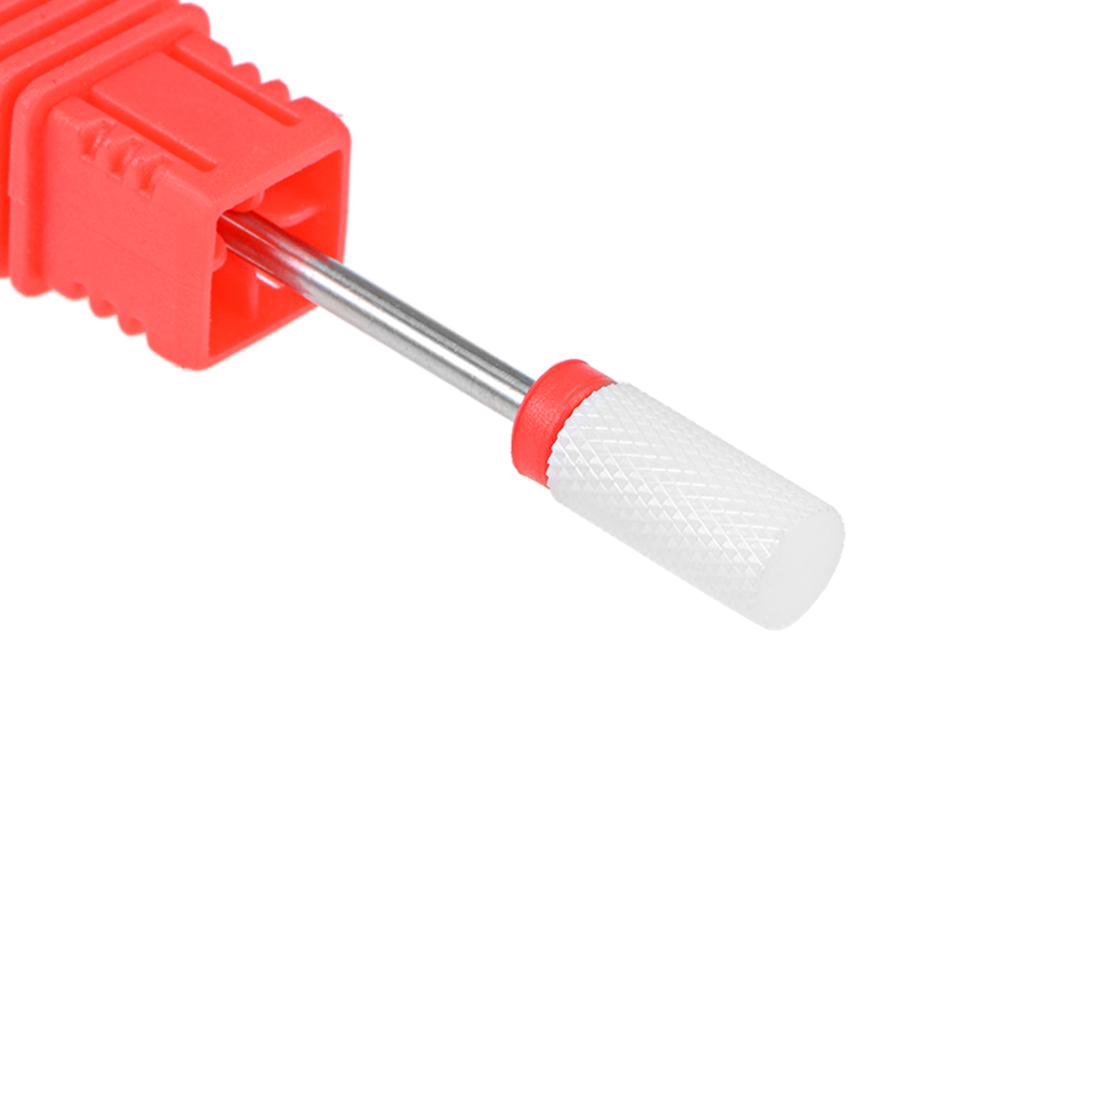 Ceramic Nail Drill Bits 3/32 inch Fine Grit Nails File Bit